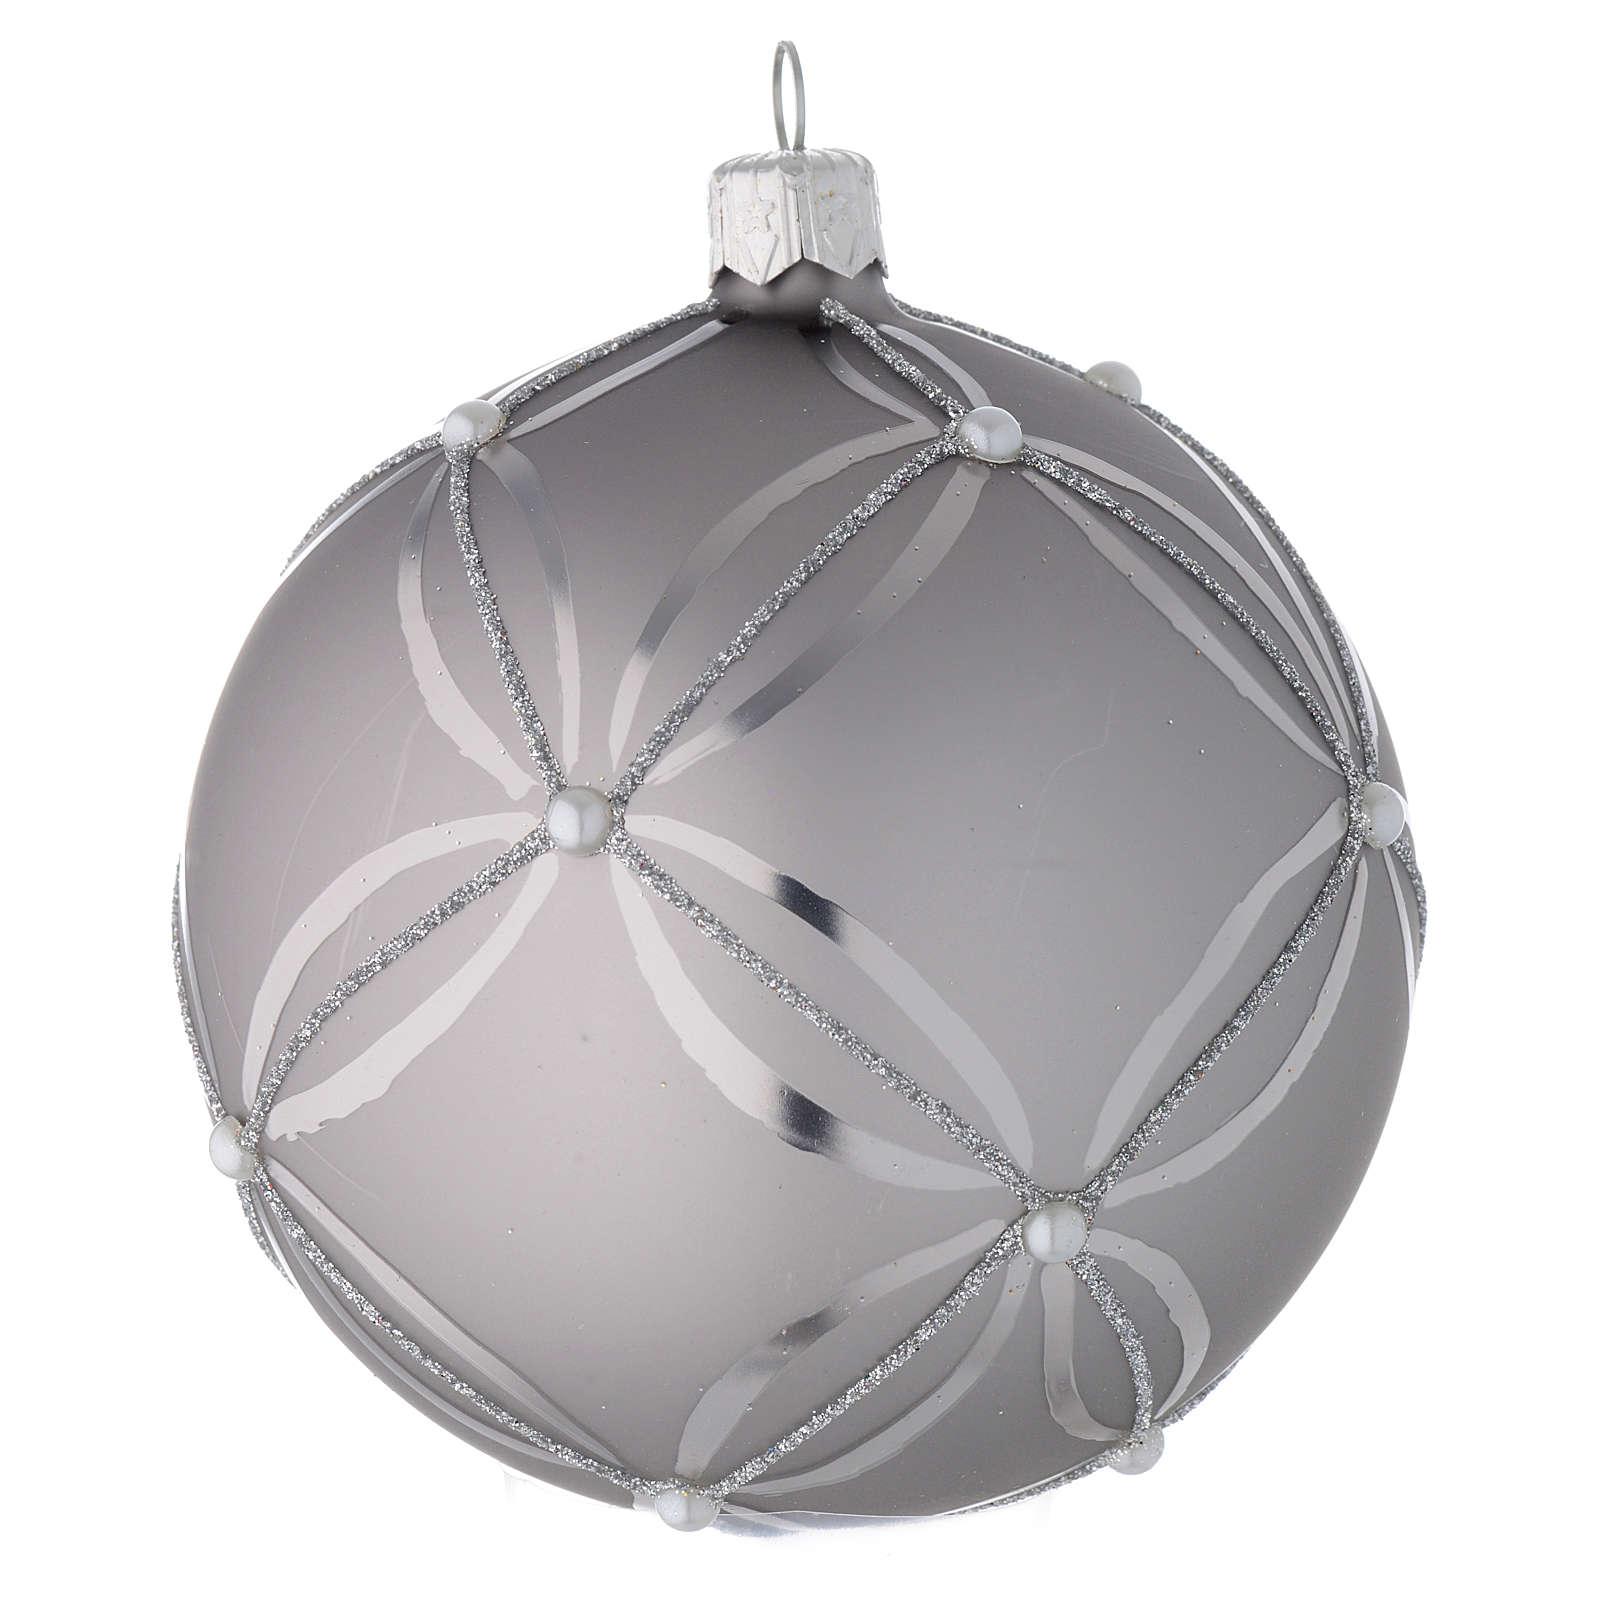 Bola para árbol de Navidad de vidrio plata lúcido/opaco 100 mm 4